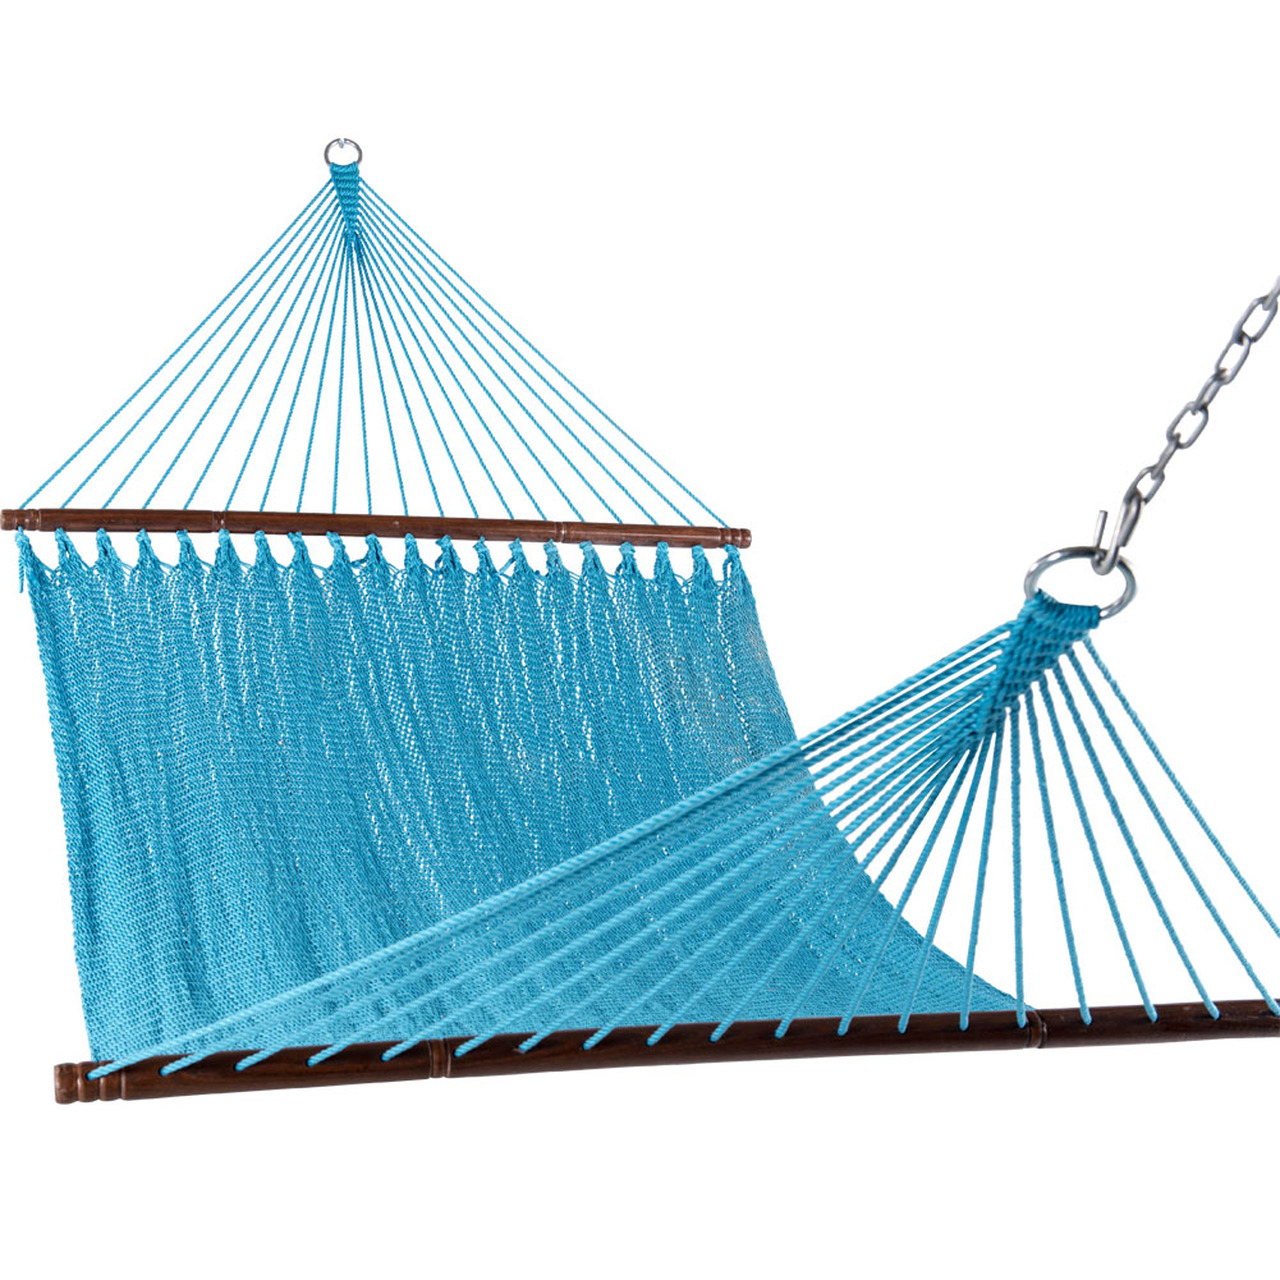 leaf dp classic yellow handmade hammock com hammocks amazon big outdoor garden sur double